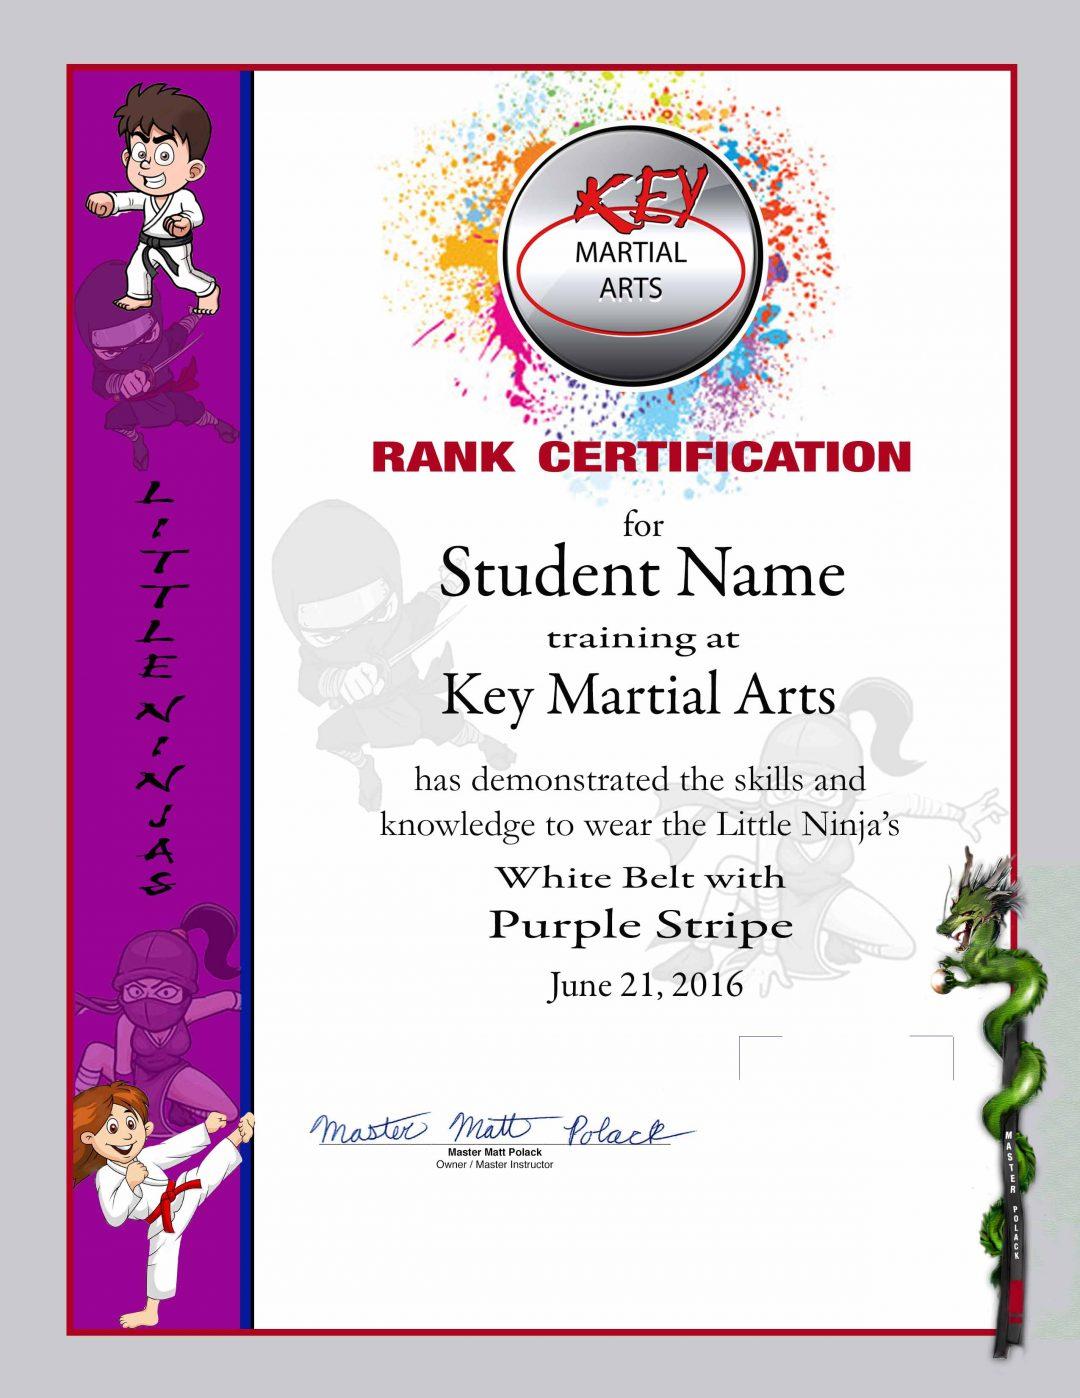 Key Martial Arts – Lower Rank Purple Belt